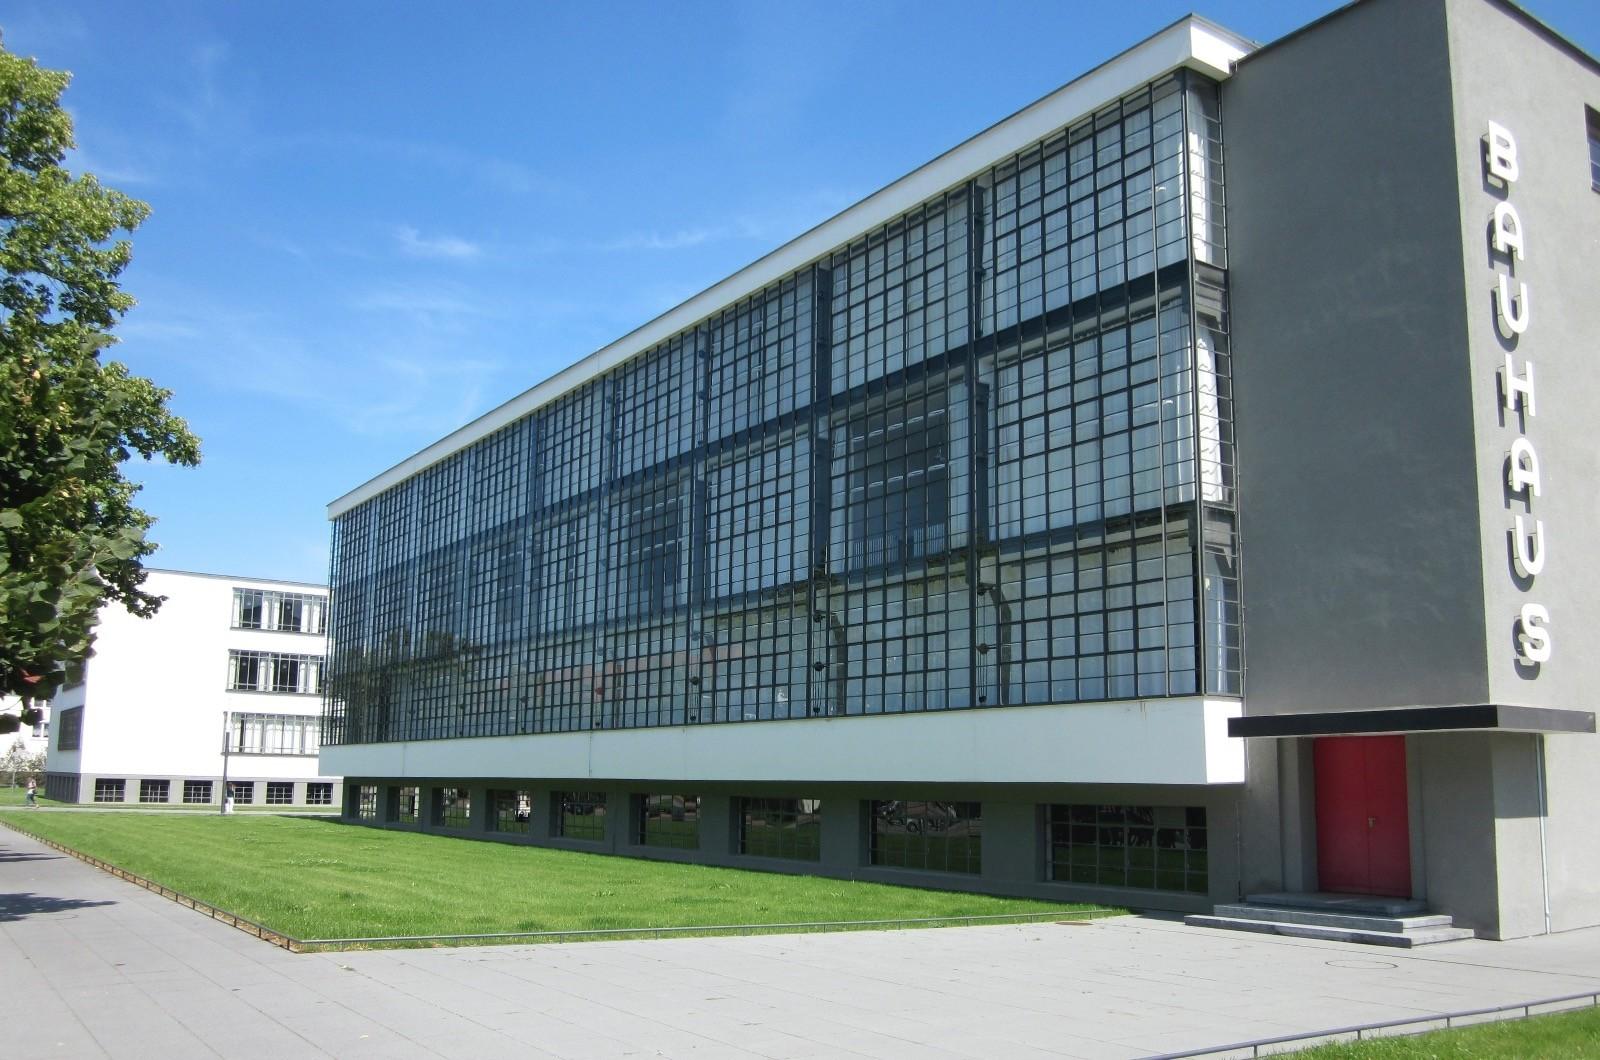 Bauhaus building in Dessau, Germany.